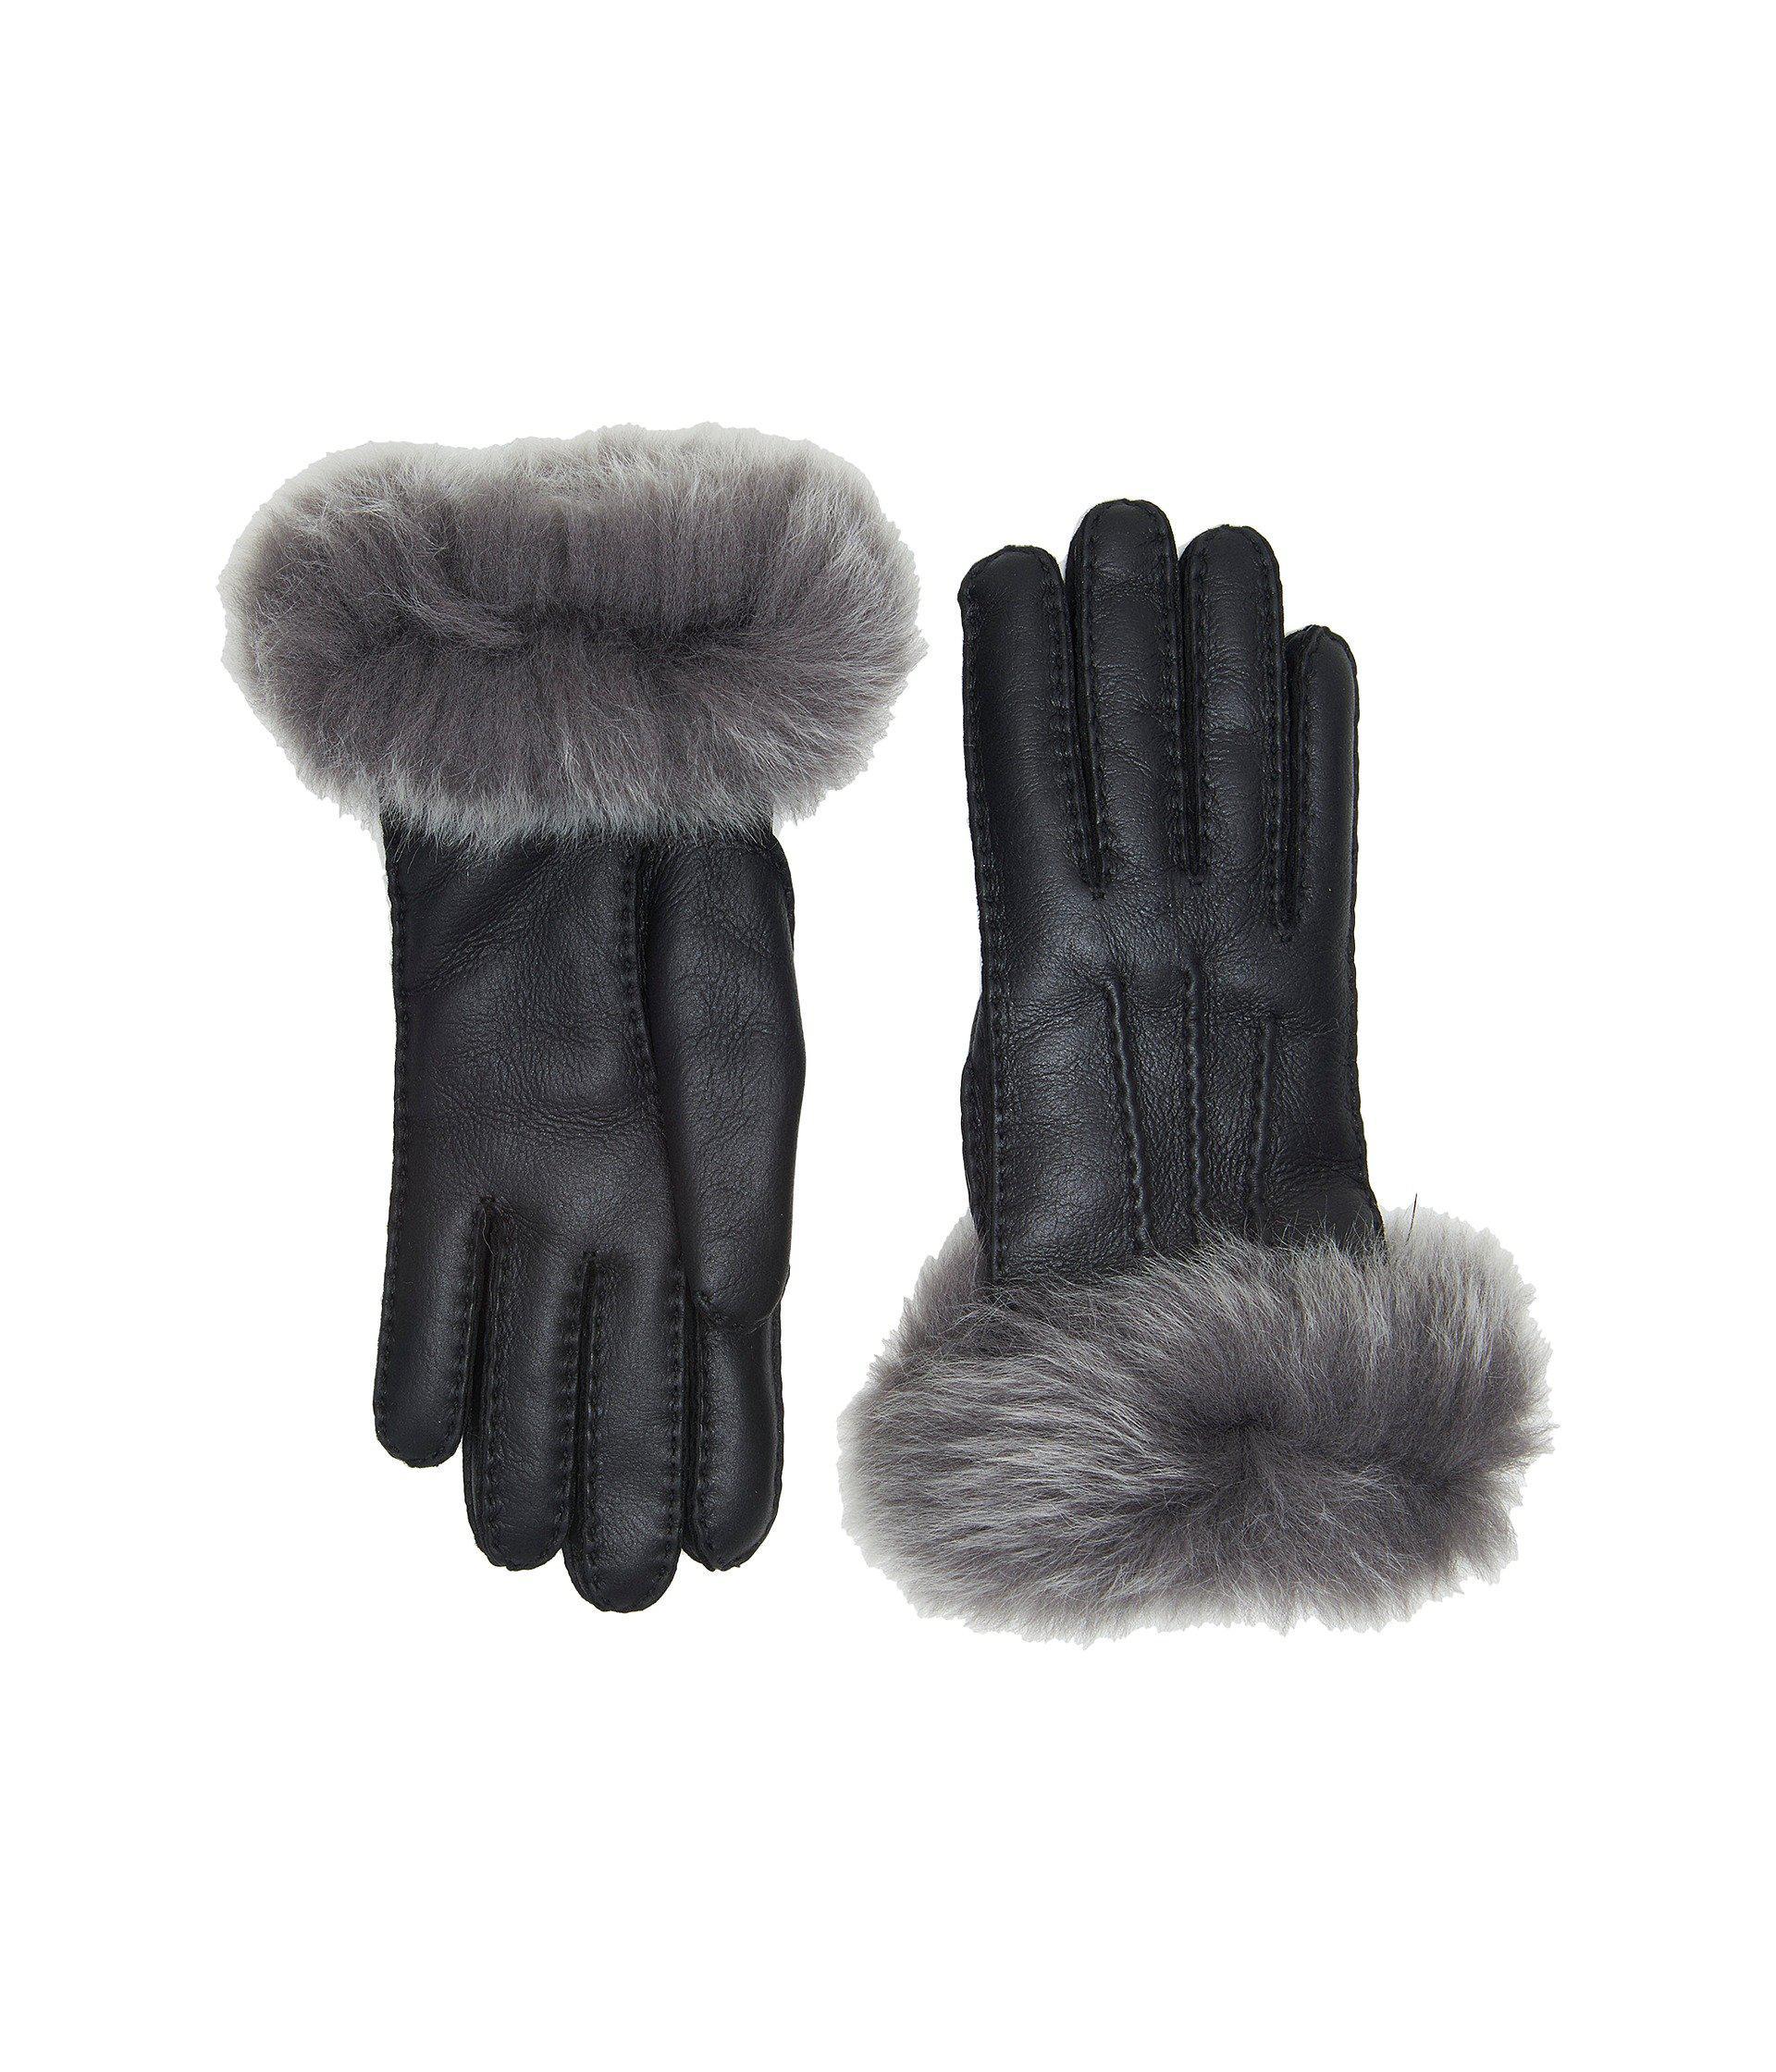 e0d10533d5b2b Lyst - UGG 3pt Toscana Waterproof Sheepskin Gloves in Black